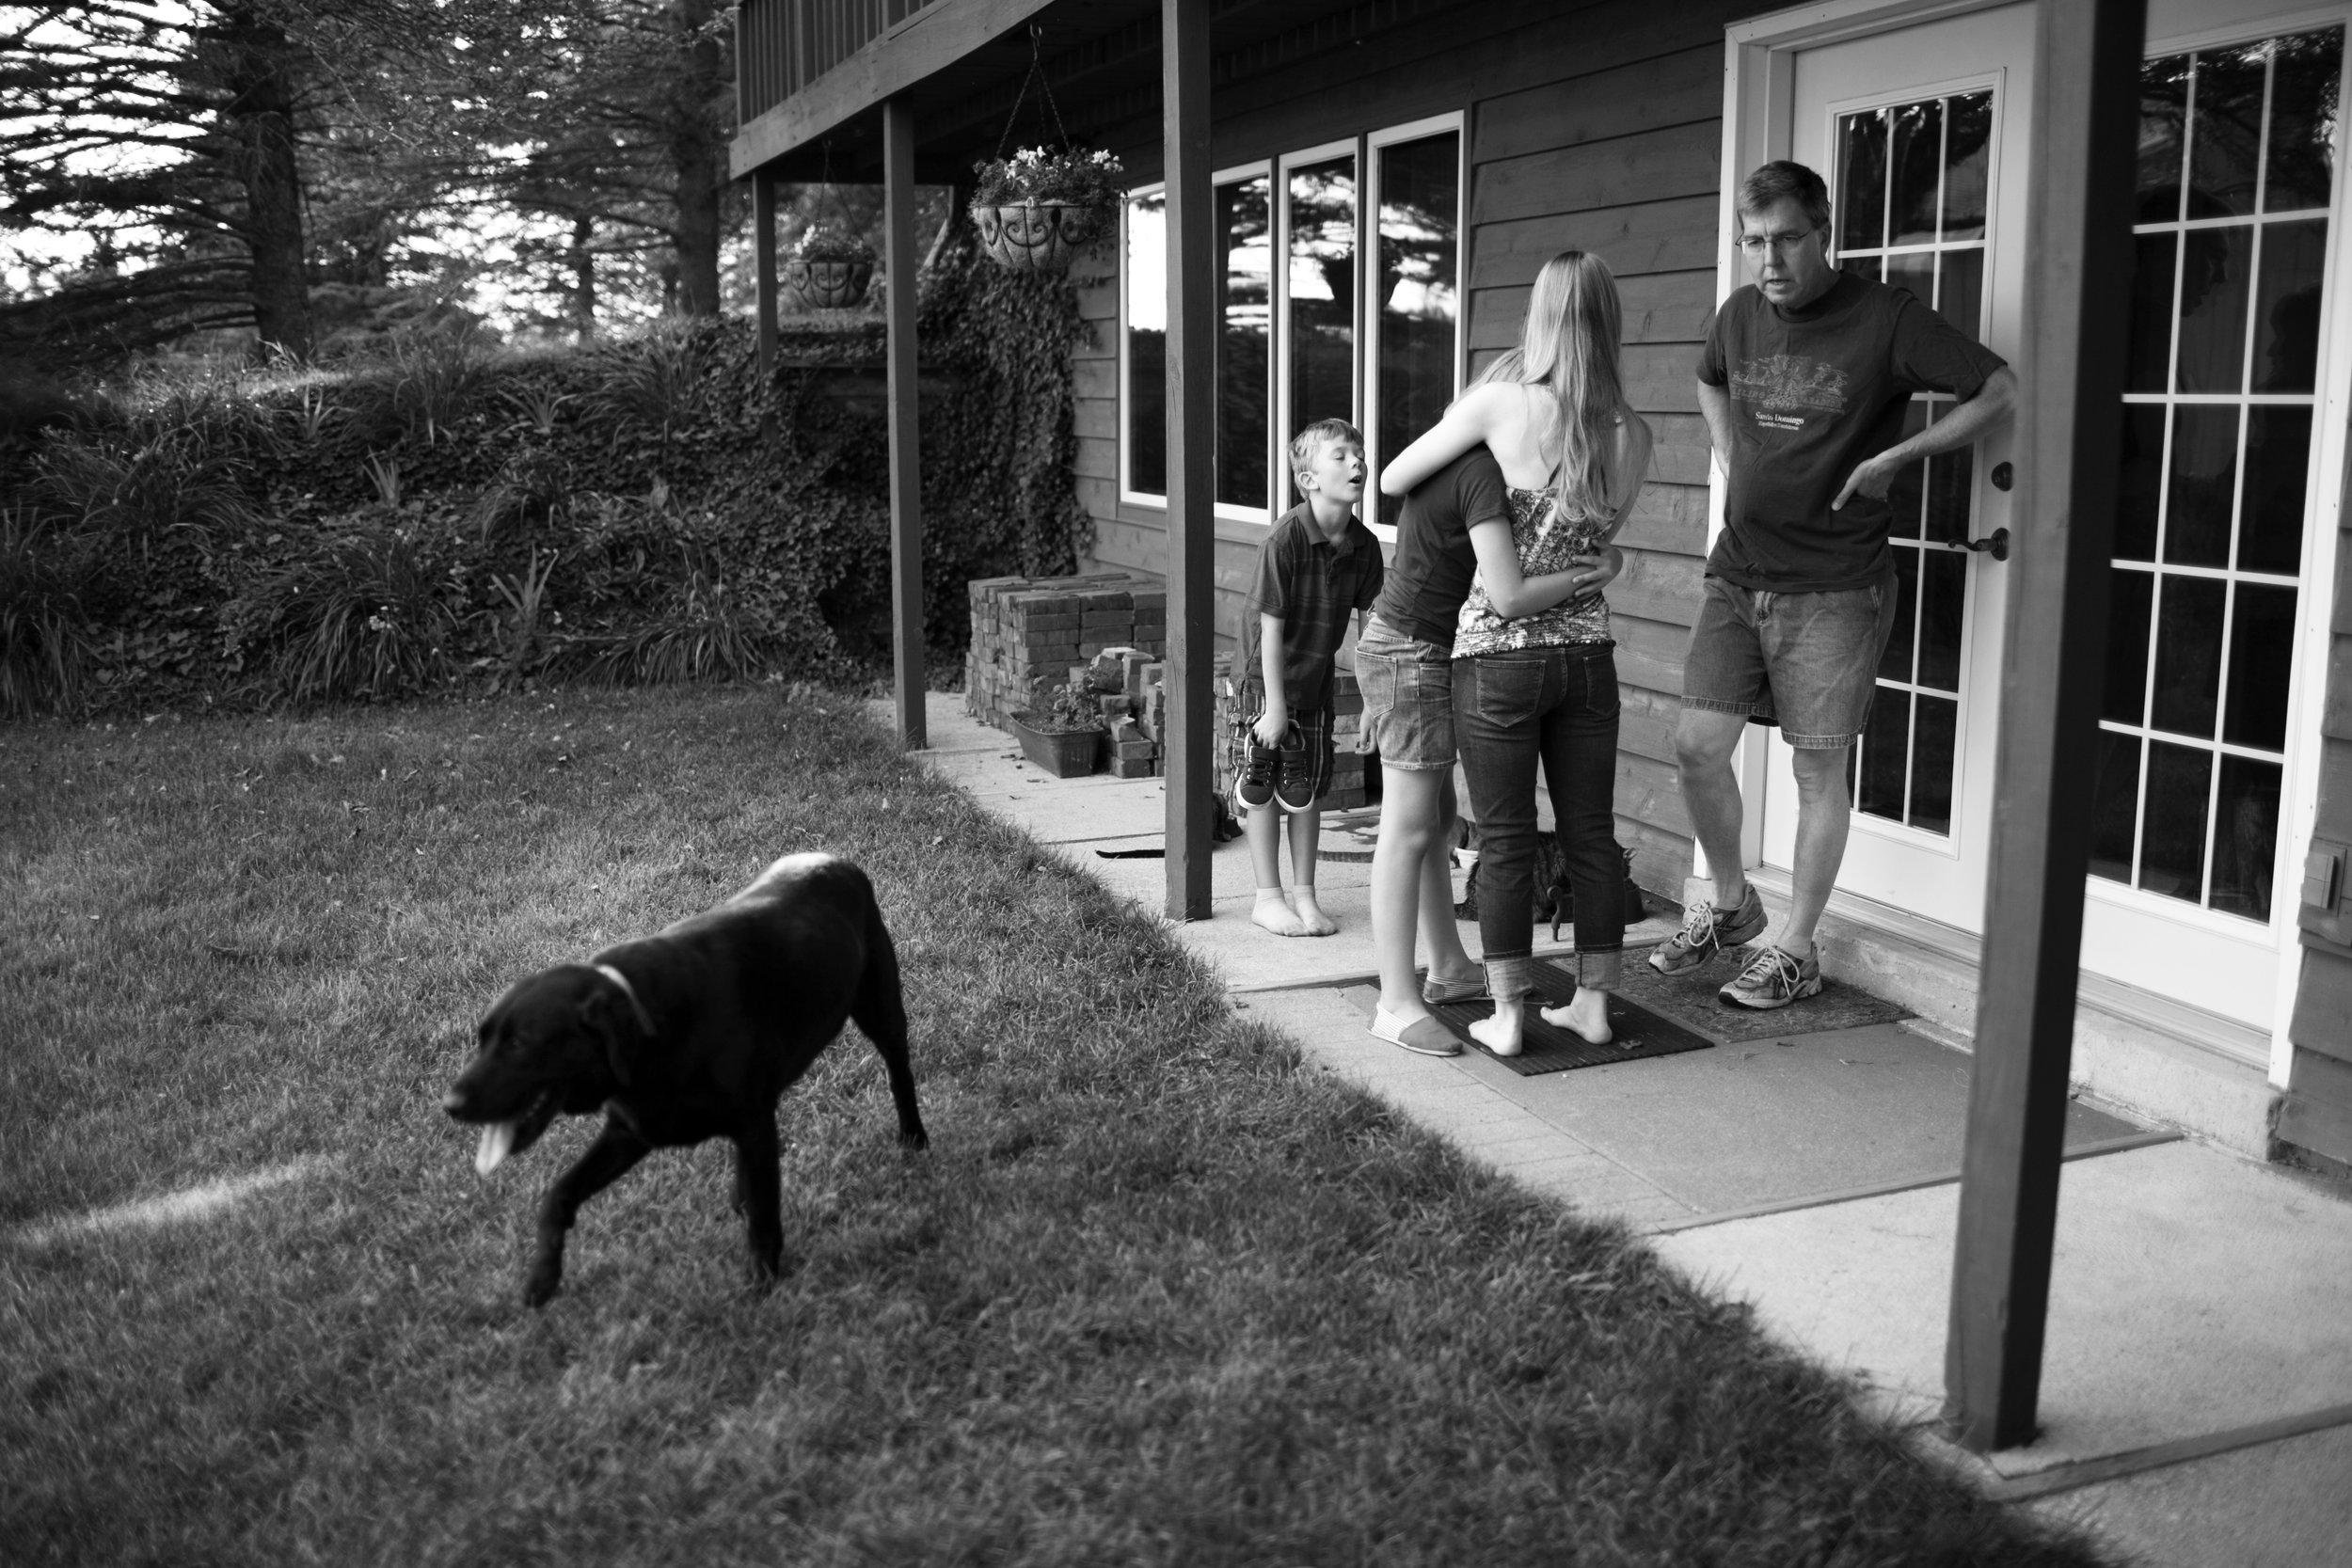 familiy playing in backyard in cedar falls